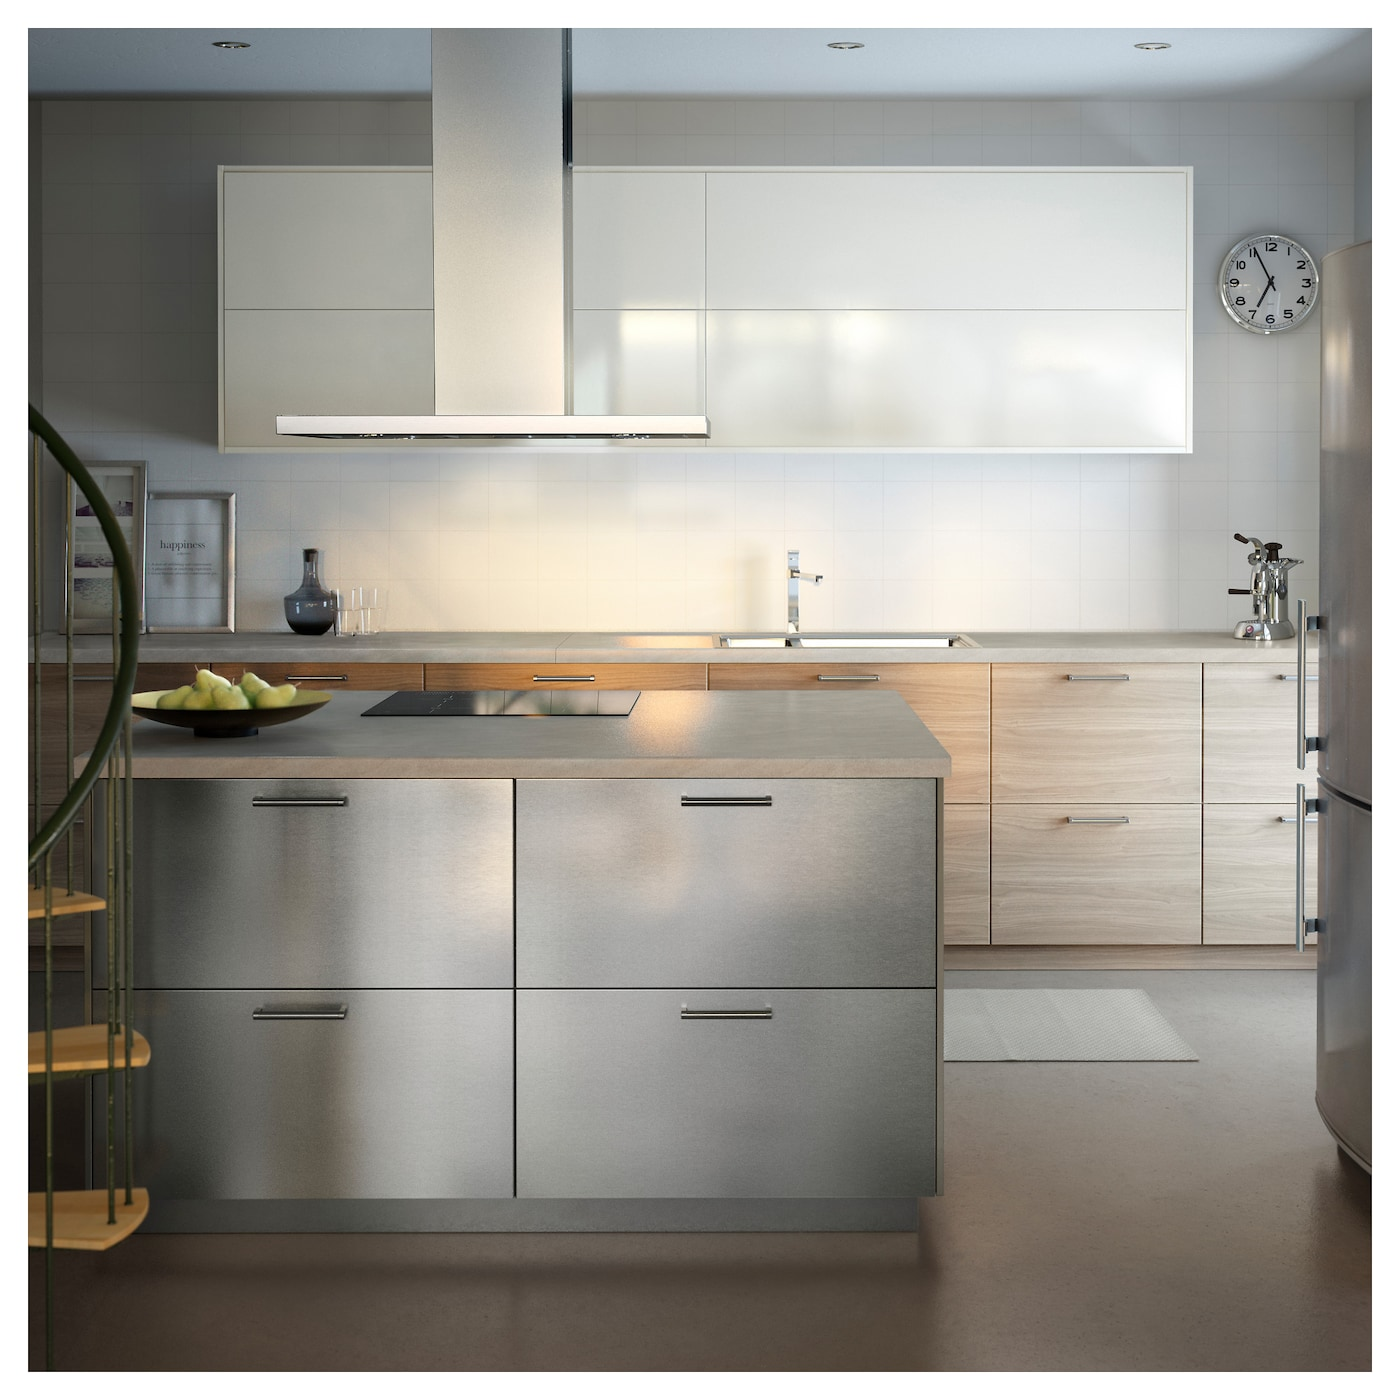 sv vande hotte aspirante plafond acier inoxydable 90 cm ikea. Black Bedroom Furniture Sets. Home Design Ideas